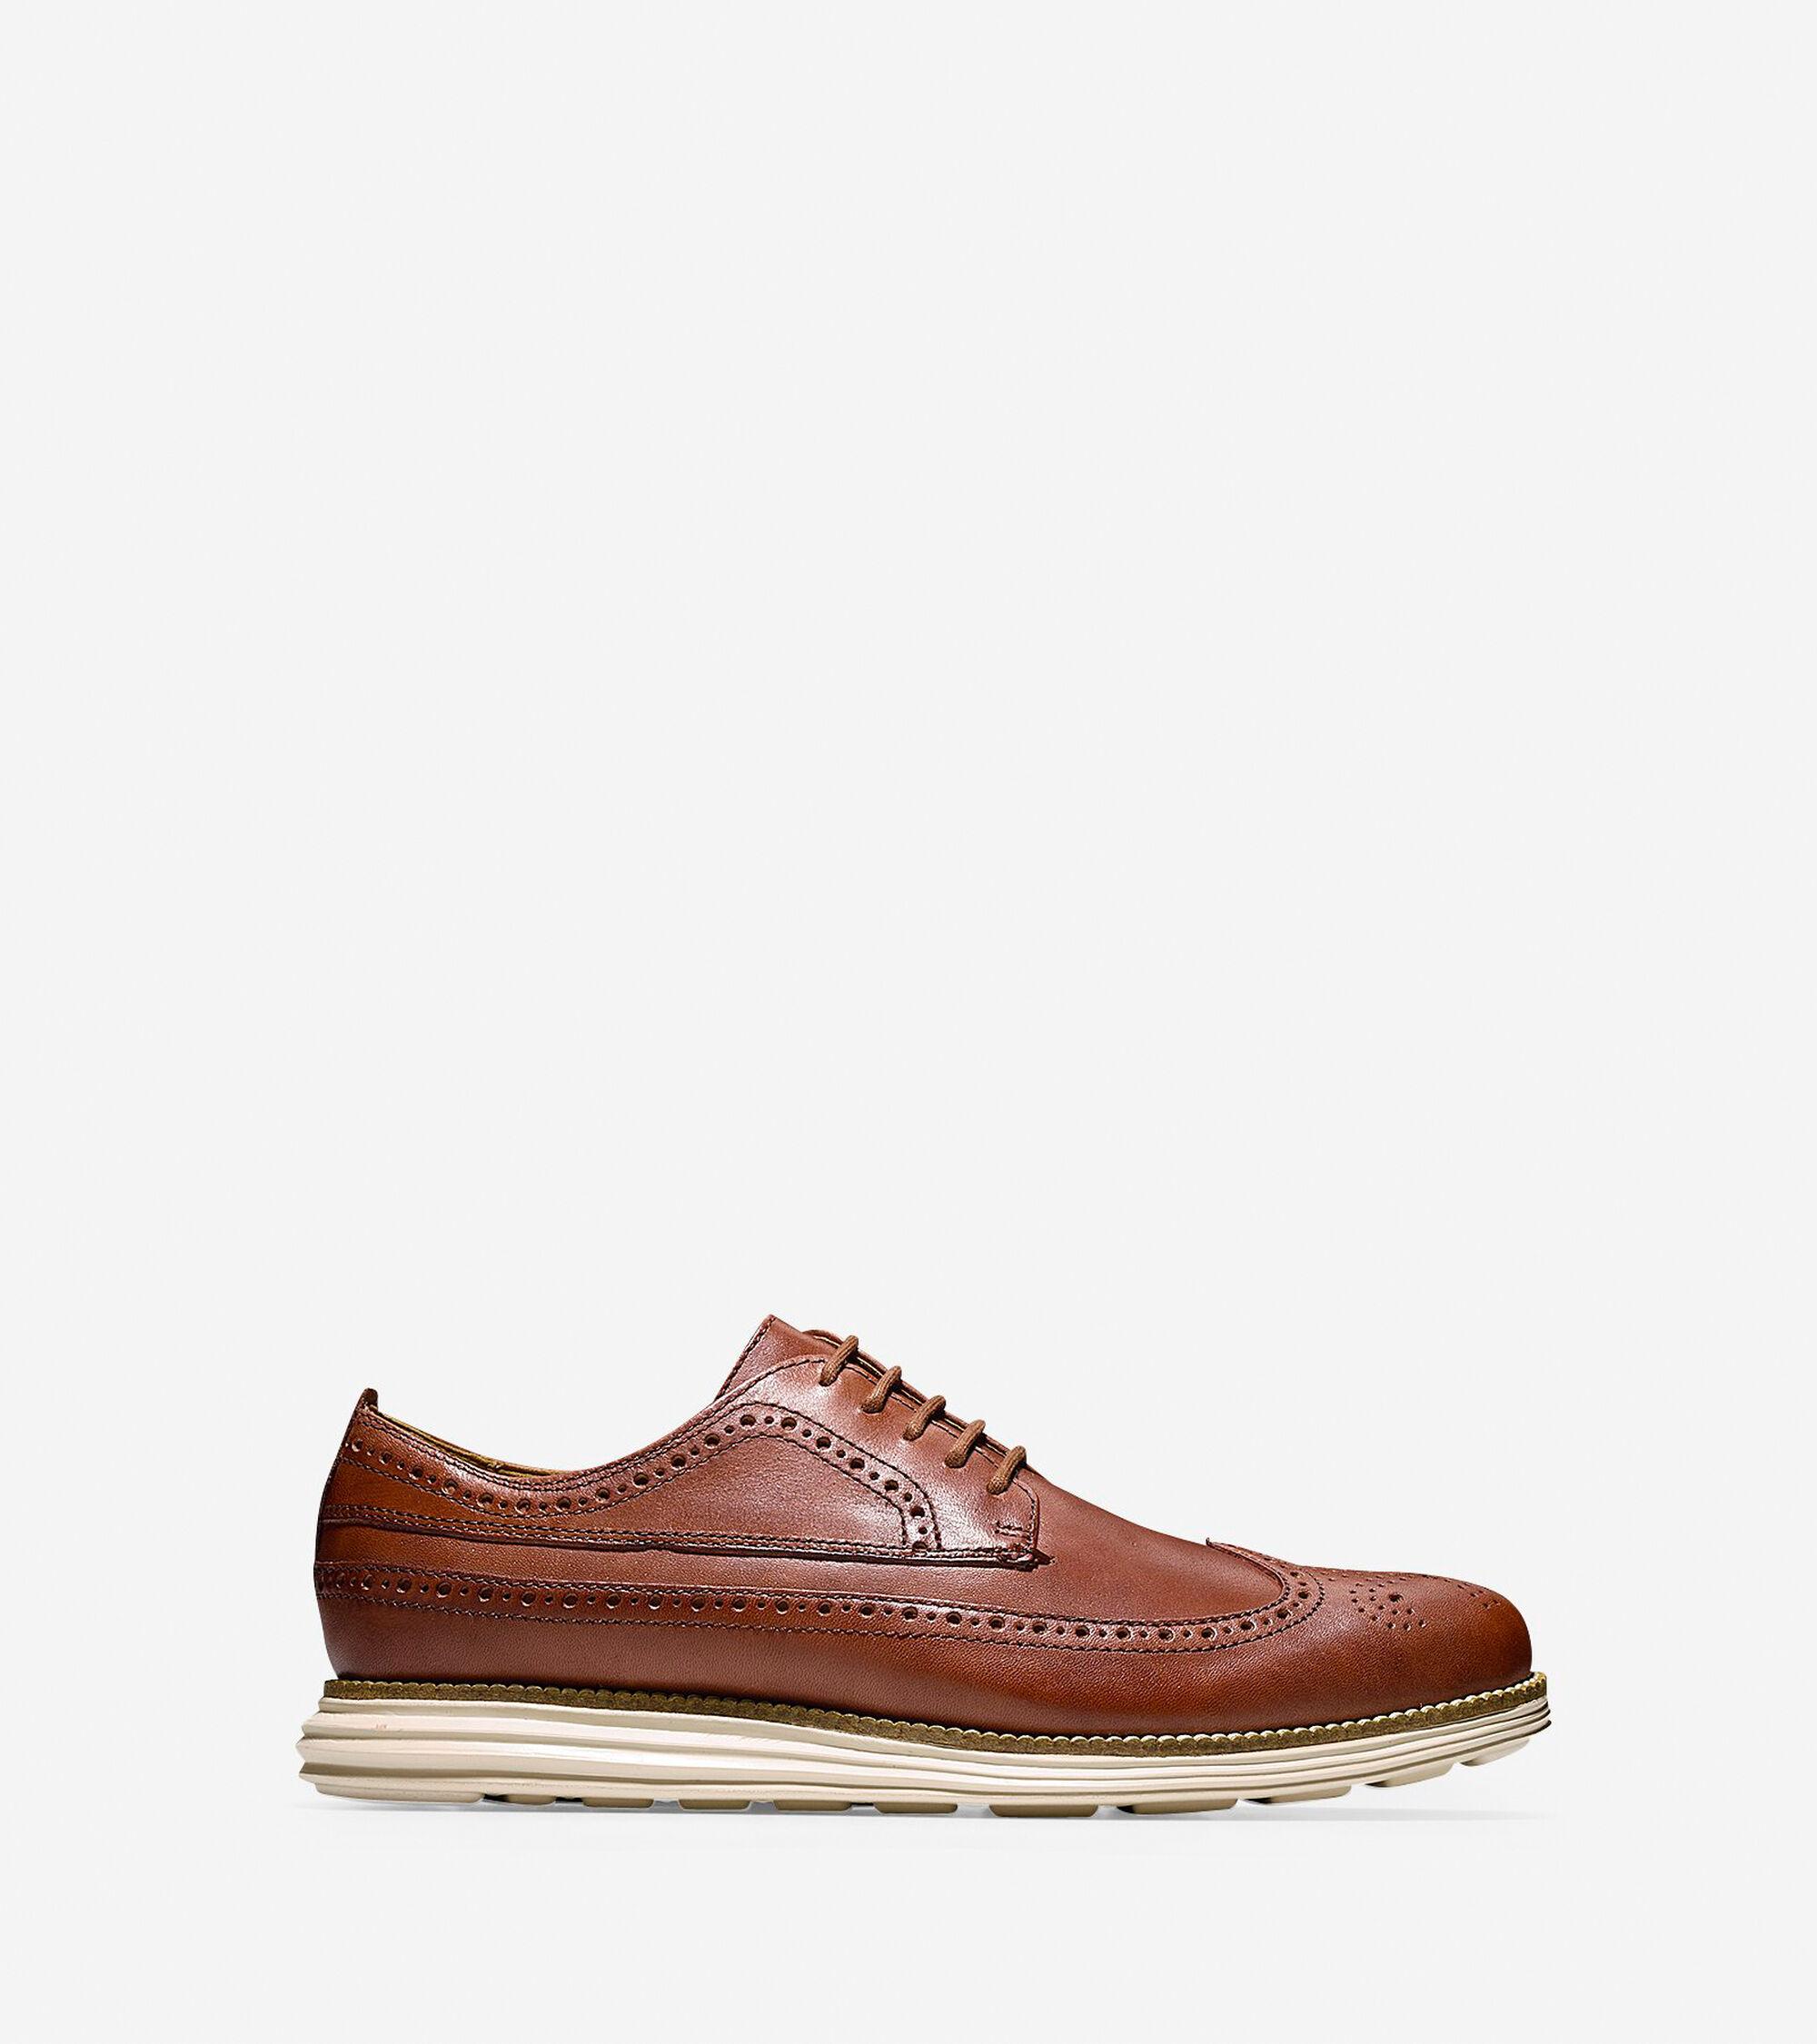 Mens Cole Haan OriginalGrand Long Wingtip Oxford Shoes